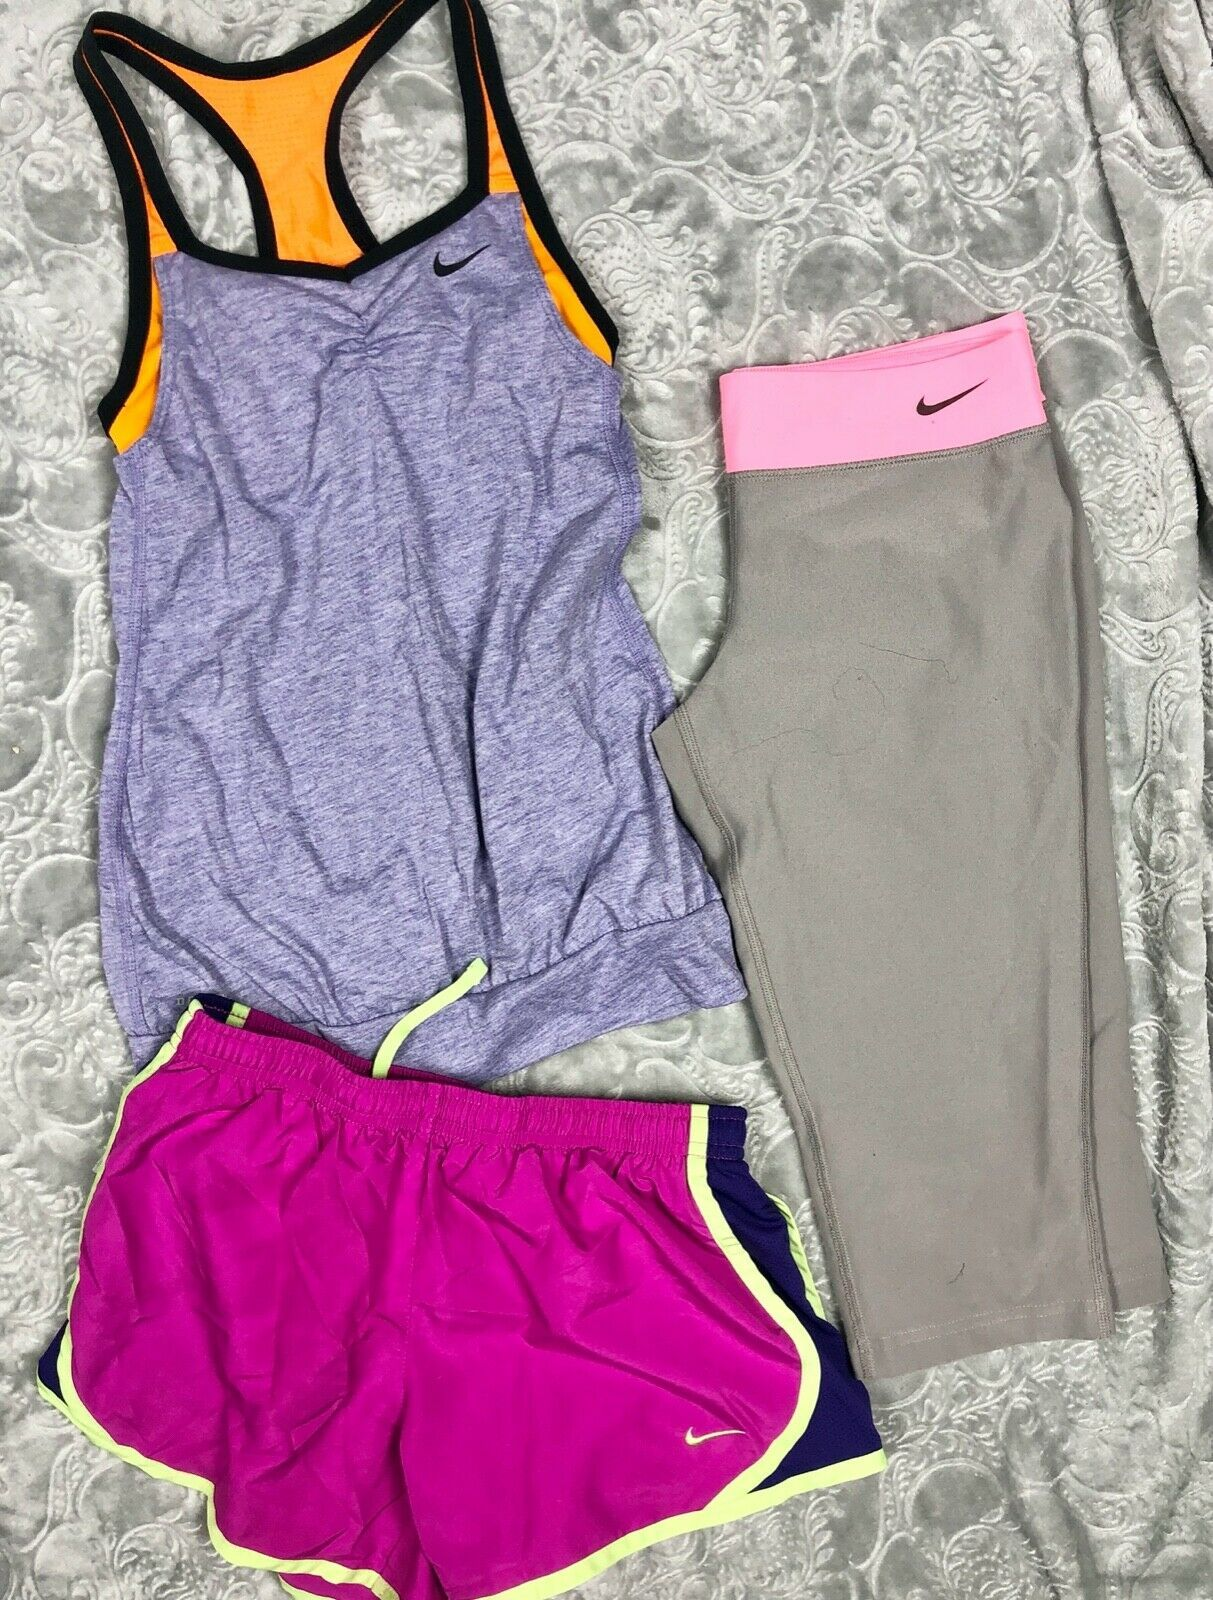 NIKE TANK TOP + TEMPO RUNNING SHORTS + CAPRI LEGGINGS OUTFIT LOT GIRL'S M